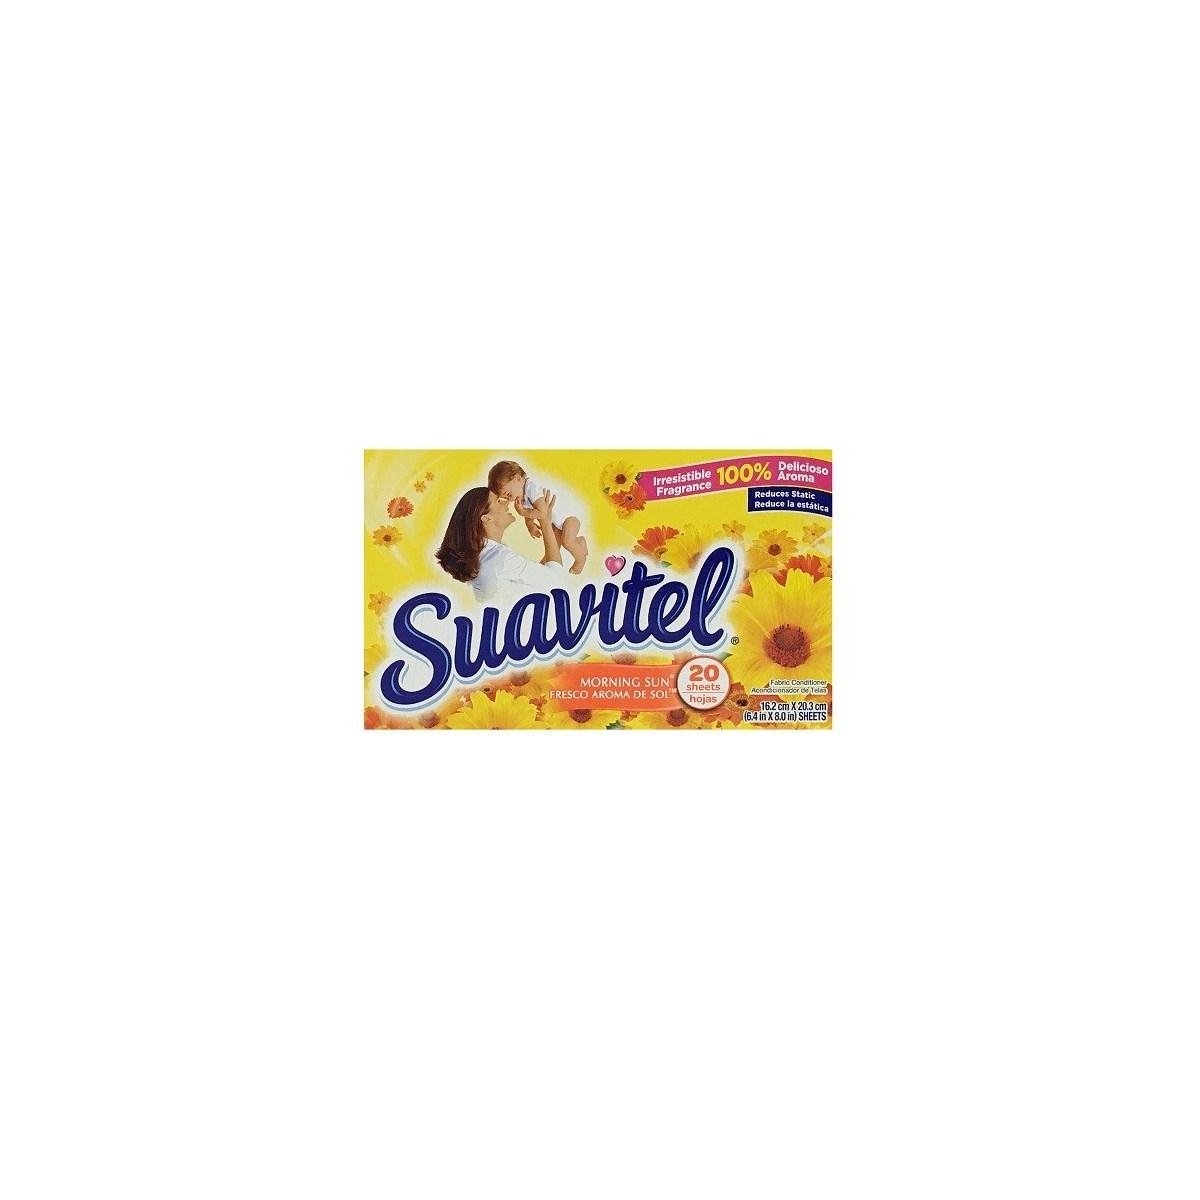 SUAVITEL DRYER SHEETS MORNIG SUN 15/20CT(3550A)